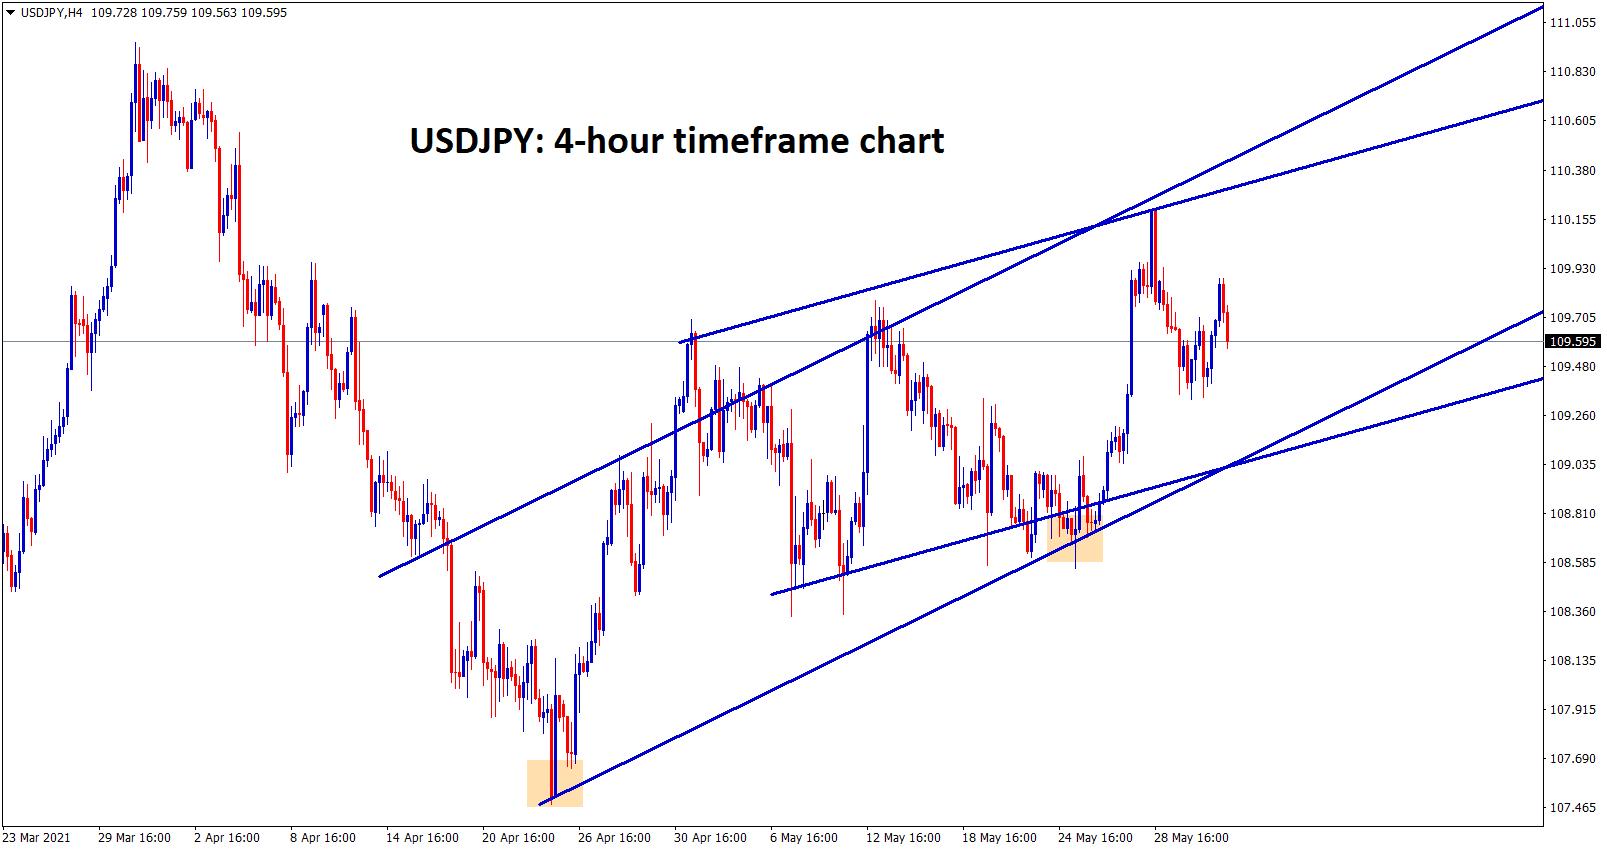 USDJPY moving between the uptrend range channels